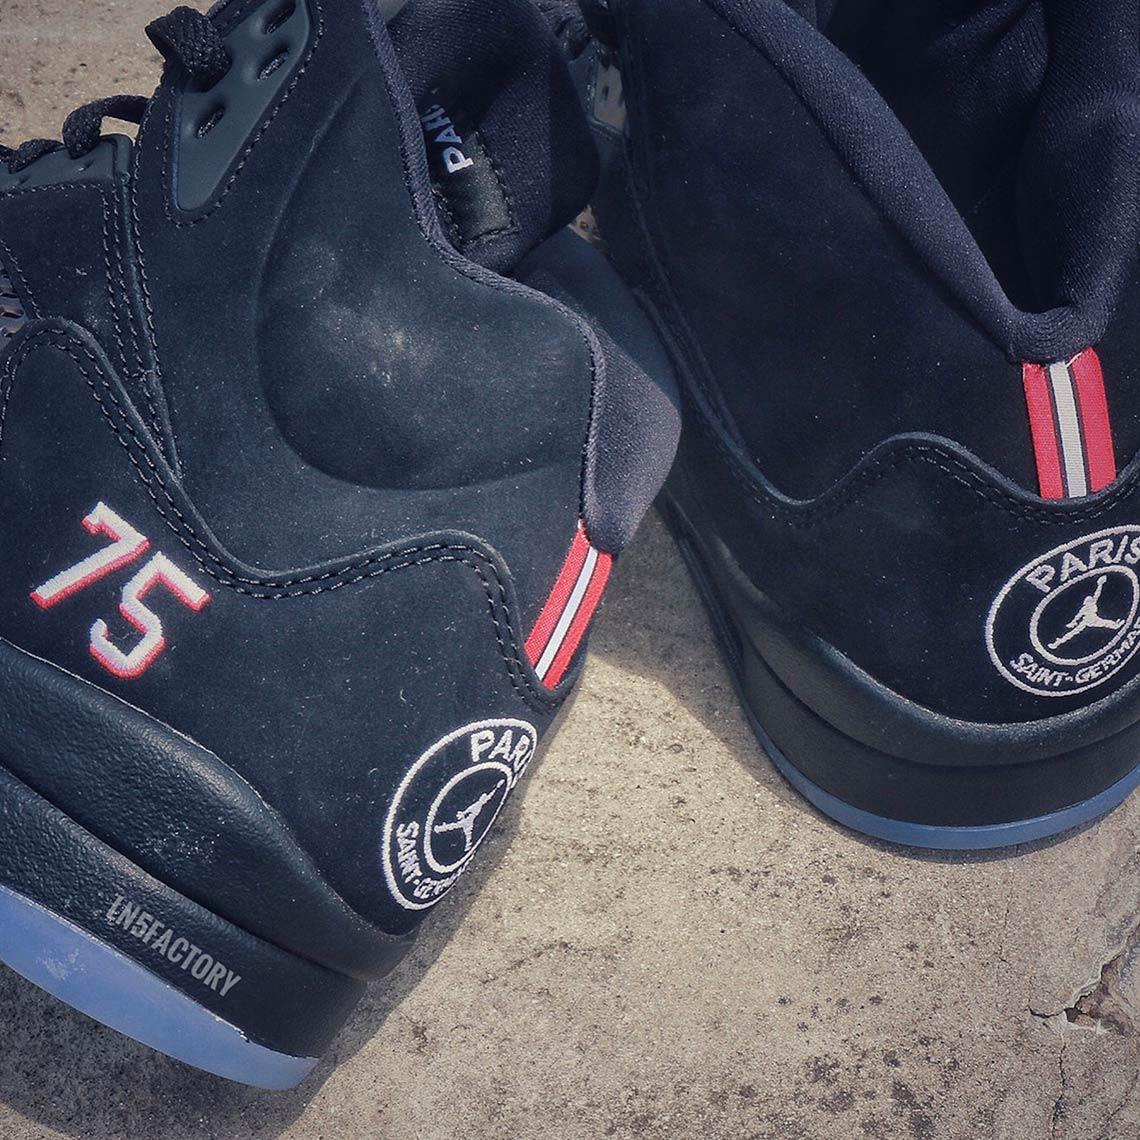 online store 8e54d 625a8 Air Jordan 5 Retro Paris Saint-Germain | SneakerNews.com